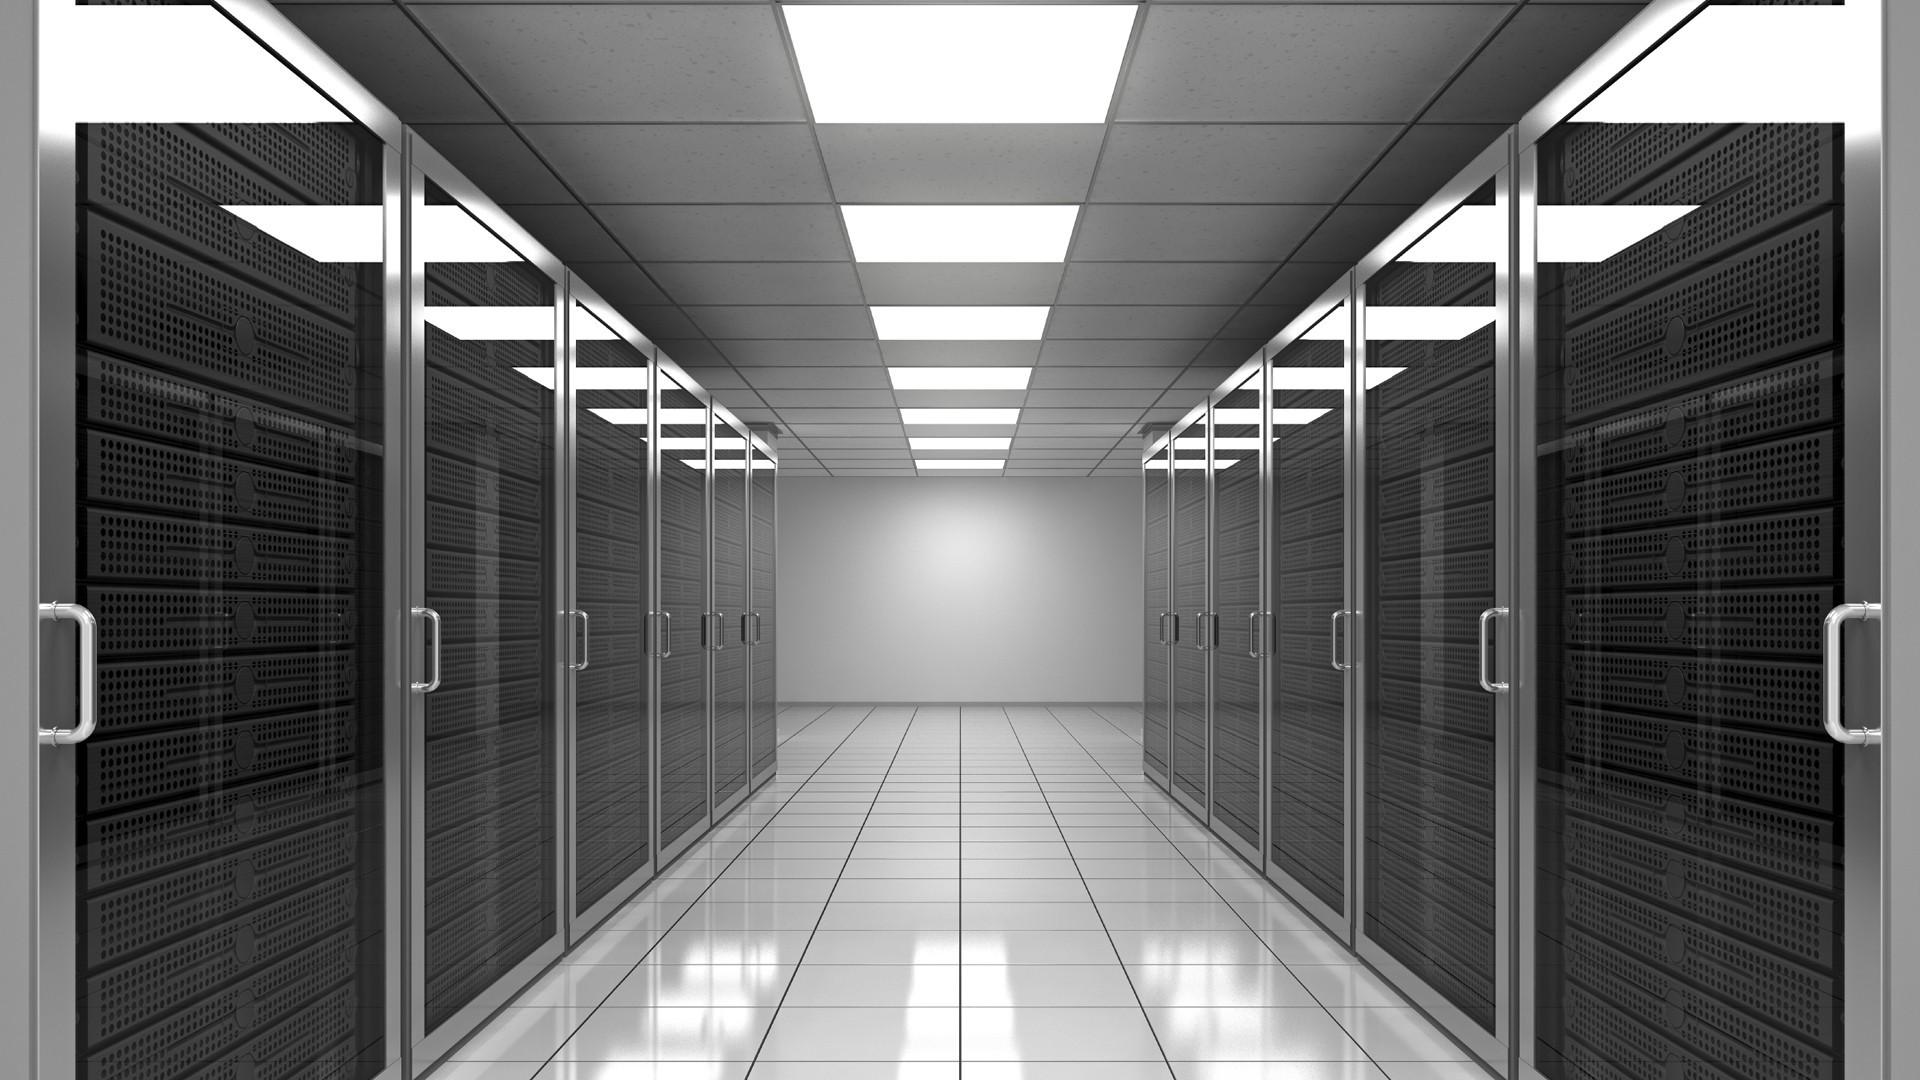 data Center, Server, Technology, Network, Computer Wallpapers HD / Desktop  and Mobile Backgrounds